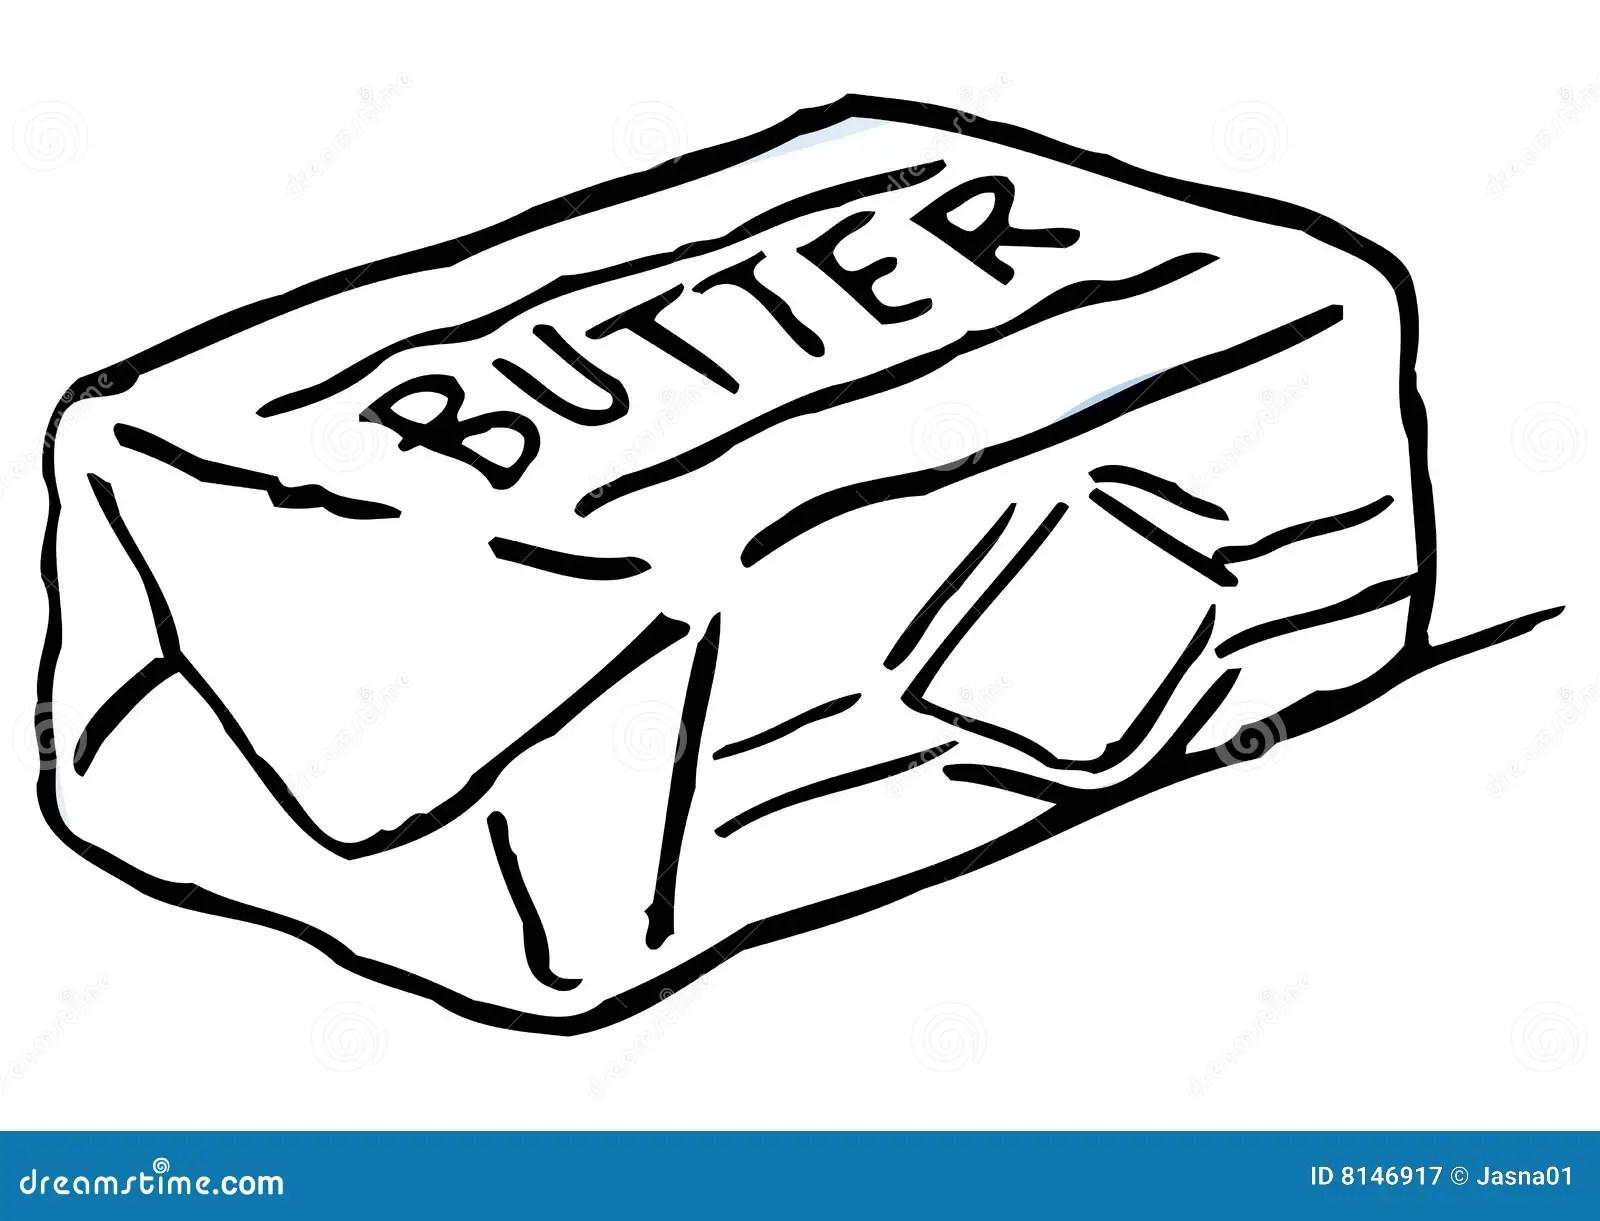 Chocolate Peanut Butter Dreams